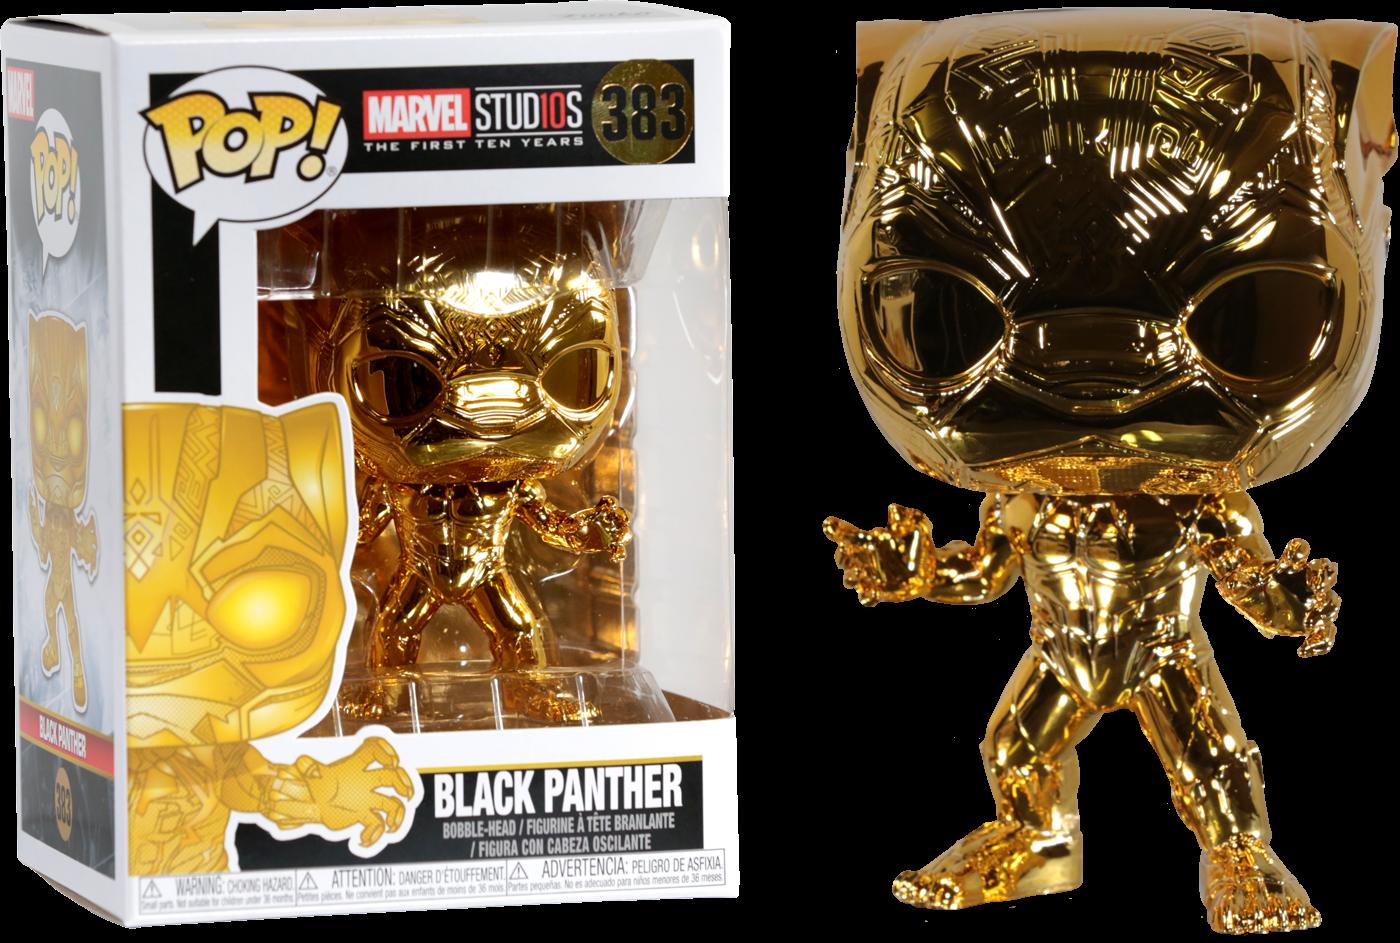 Marvel Studios: The First Ten Years - Black Panther Gold Chrome Pop! Vinyl Figure